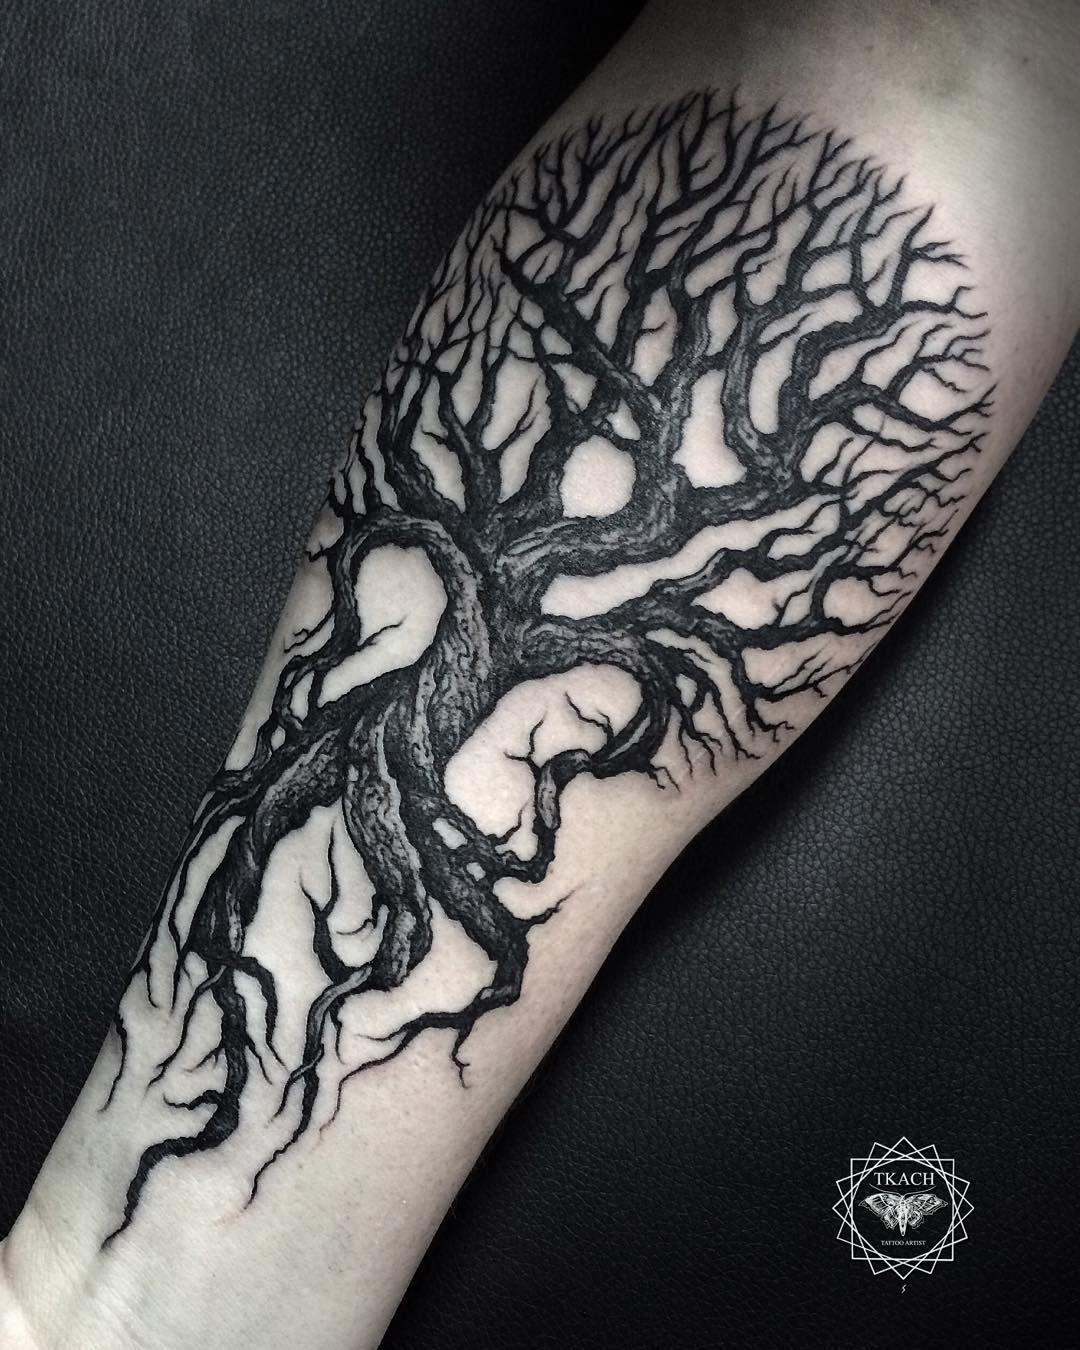 7 Meilleures Images Du Tableau Tatouage Yggdrasil Tree Of Life